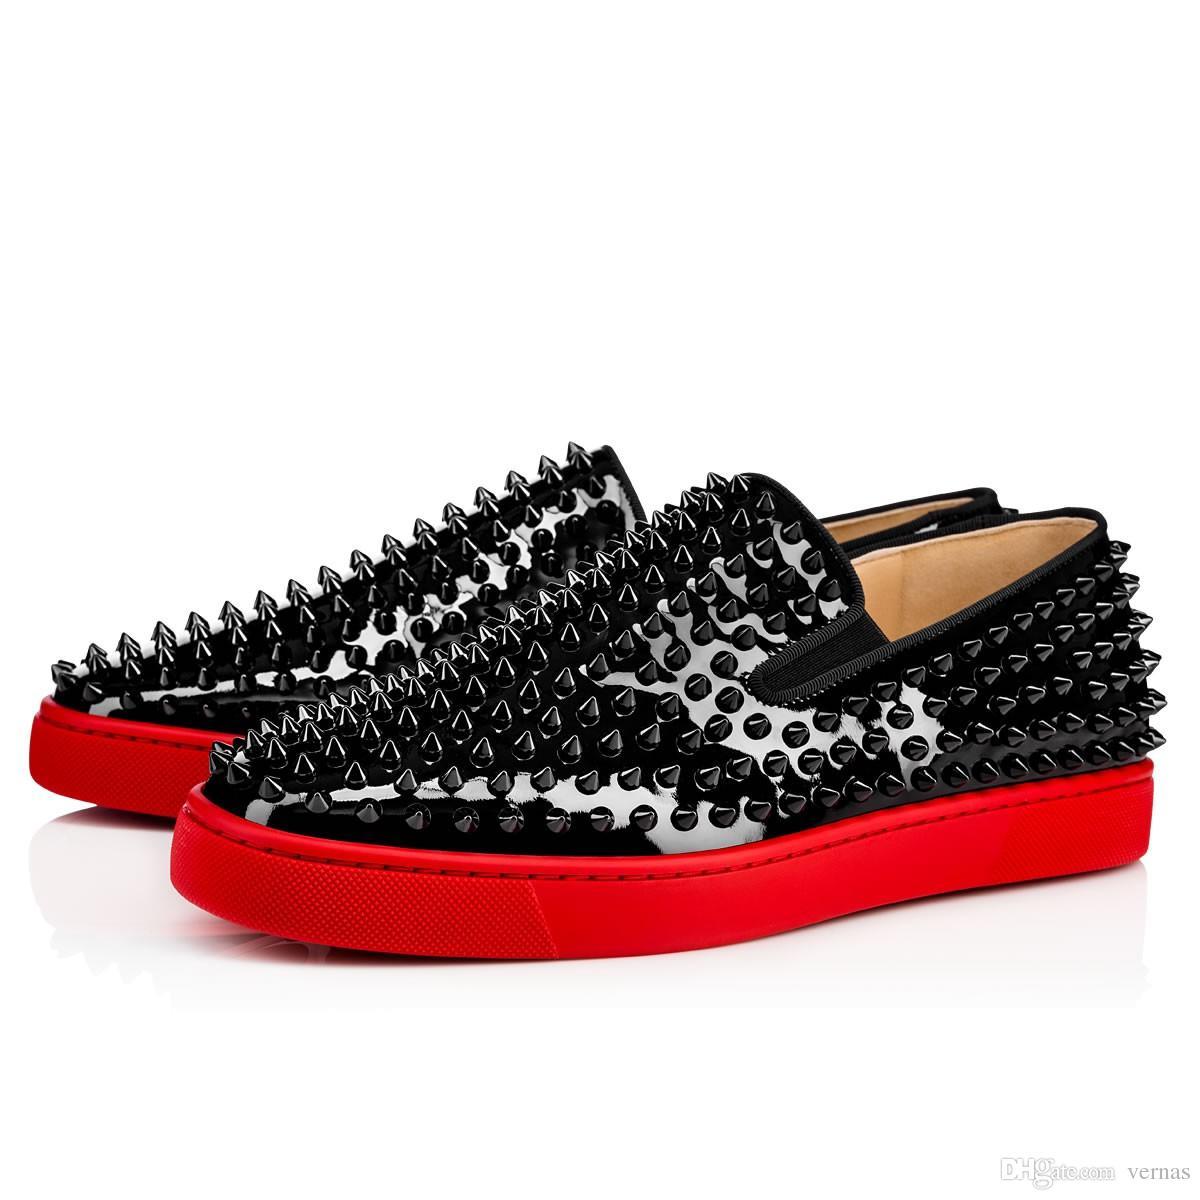 Red Bottom Loafers Shoes Roller Boat Mens Flat Walking Flatsunisex